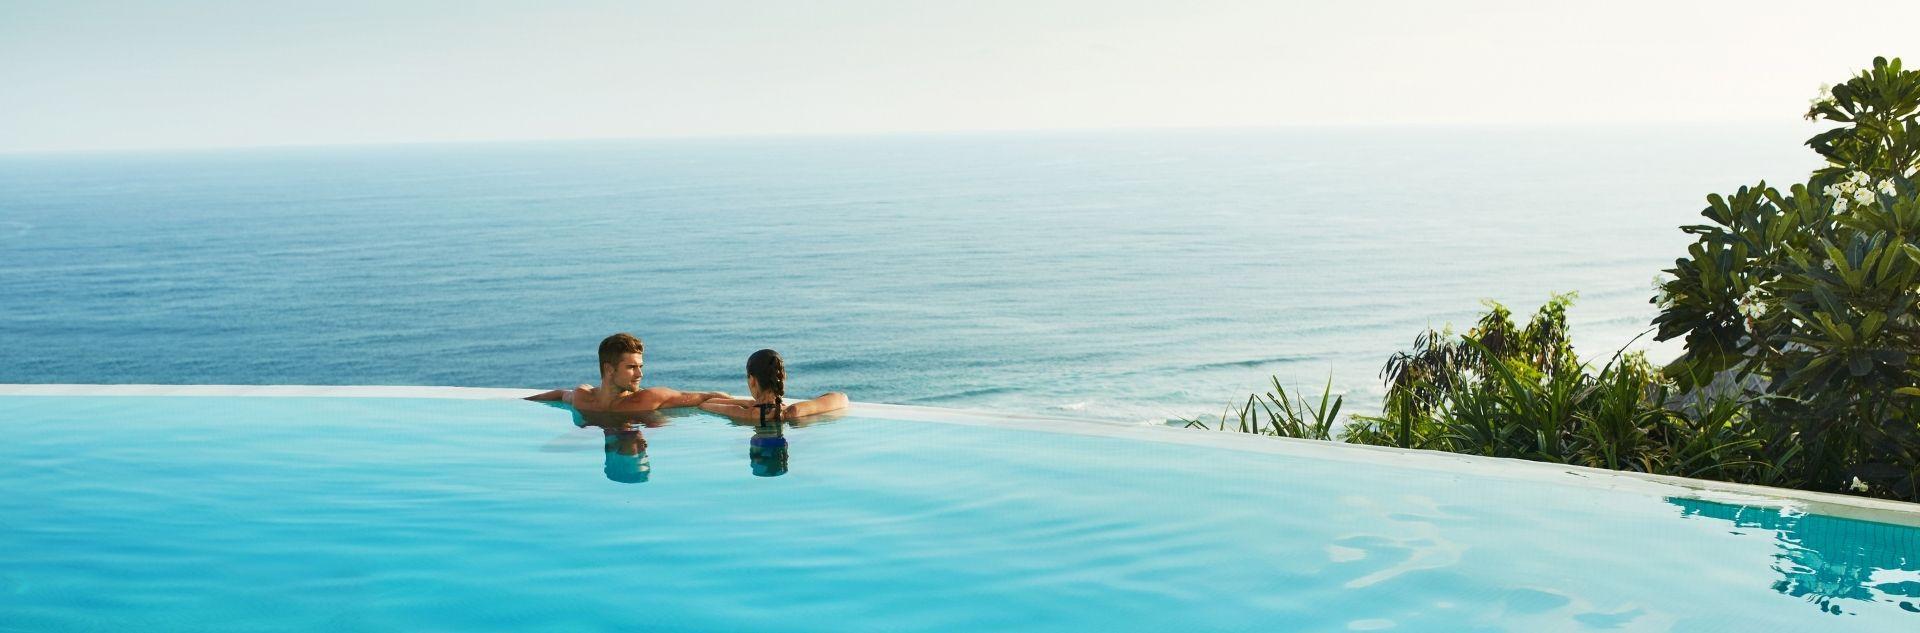 Paar im Infinity Pool -Urlaubsideen entdecken